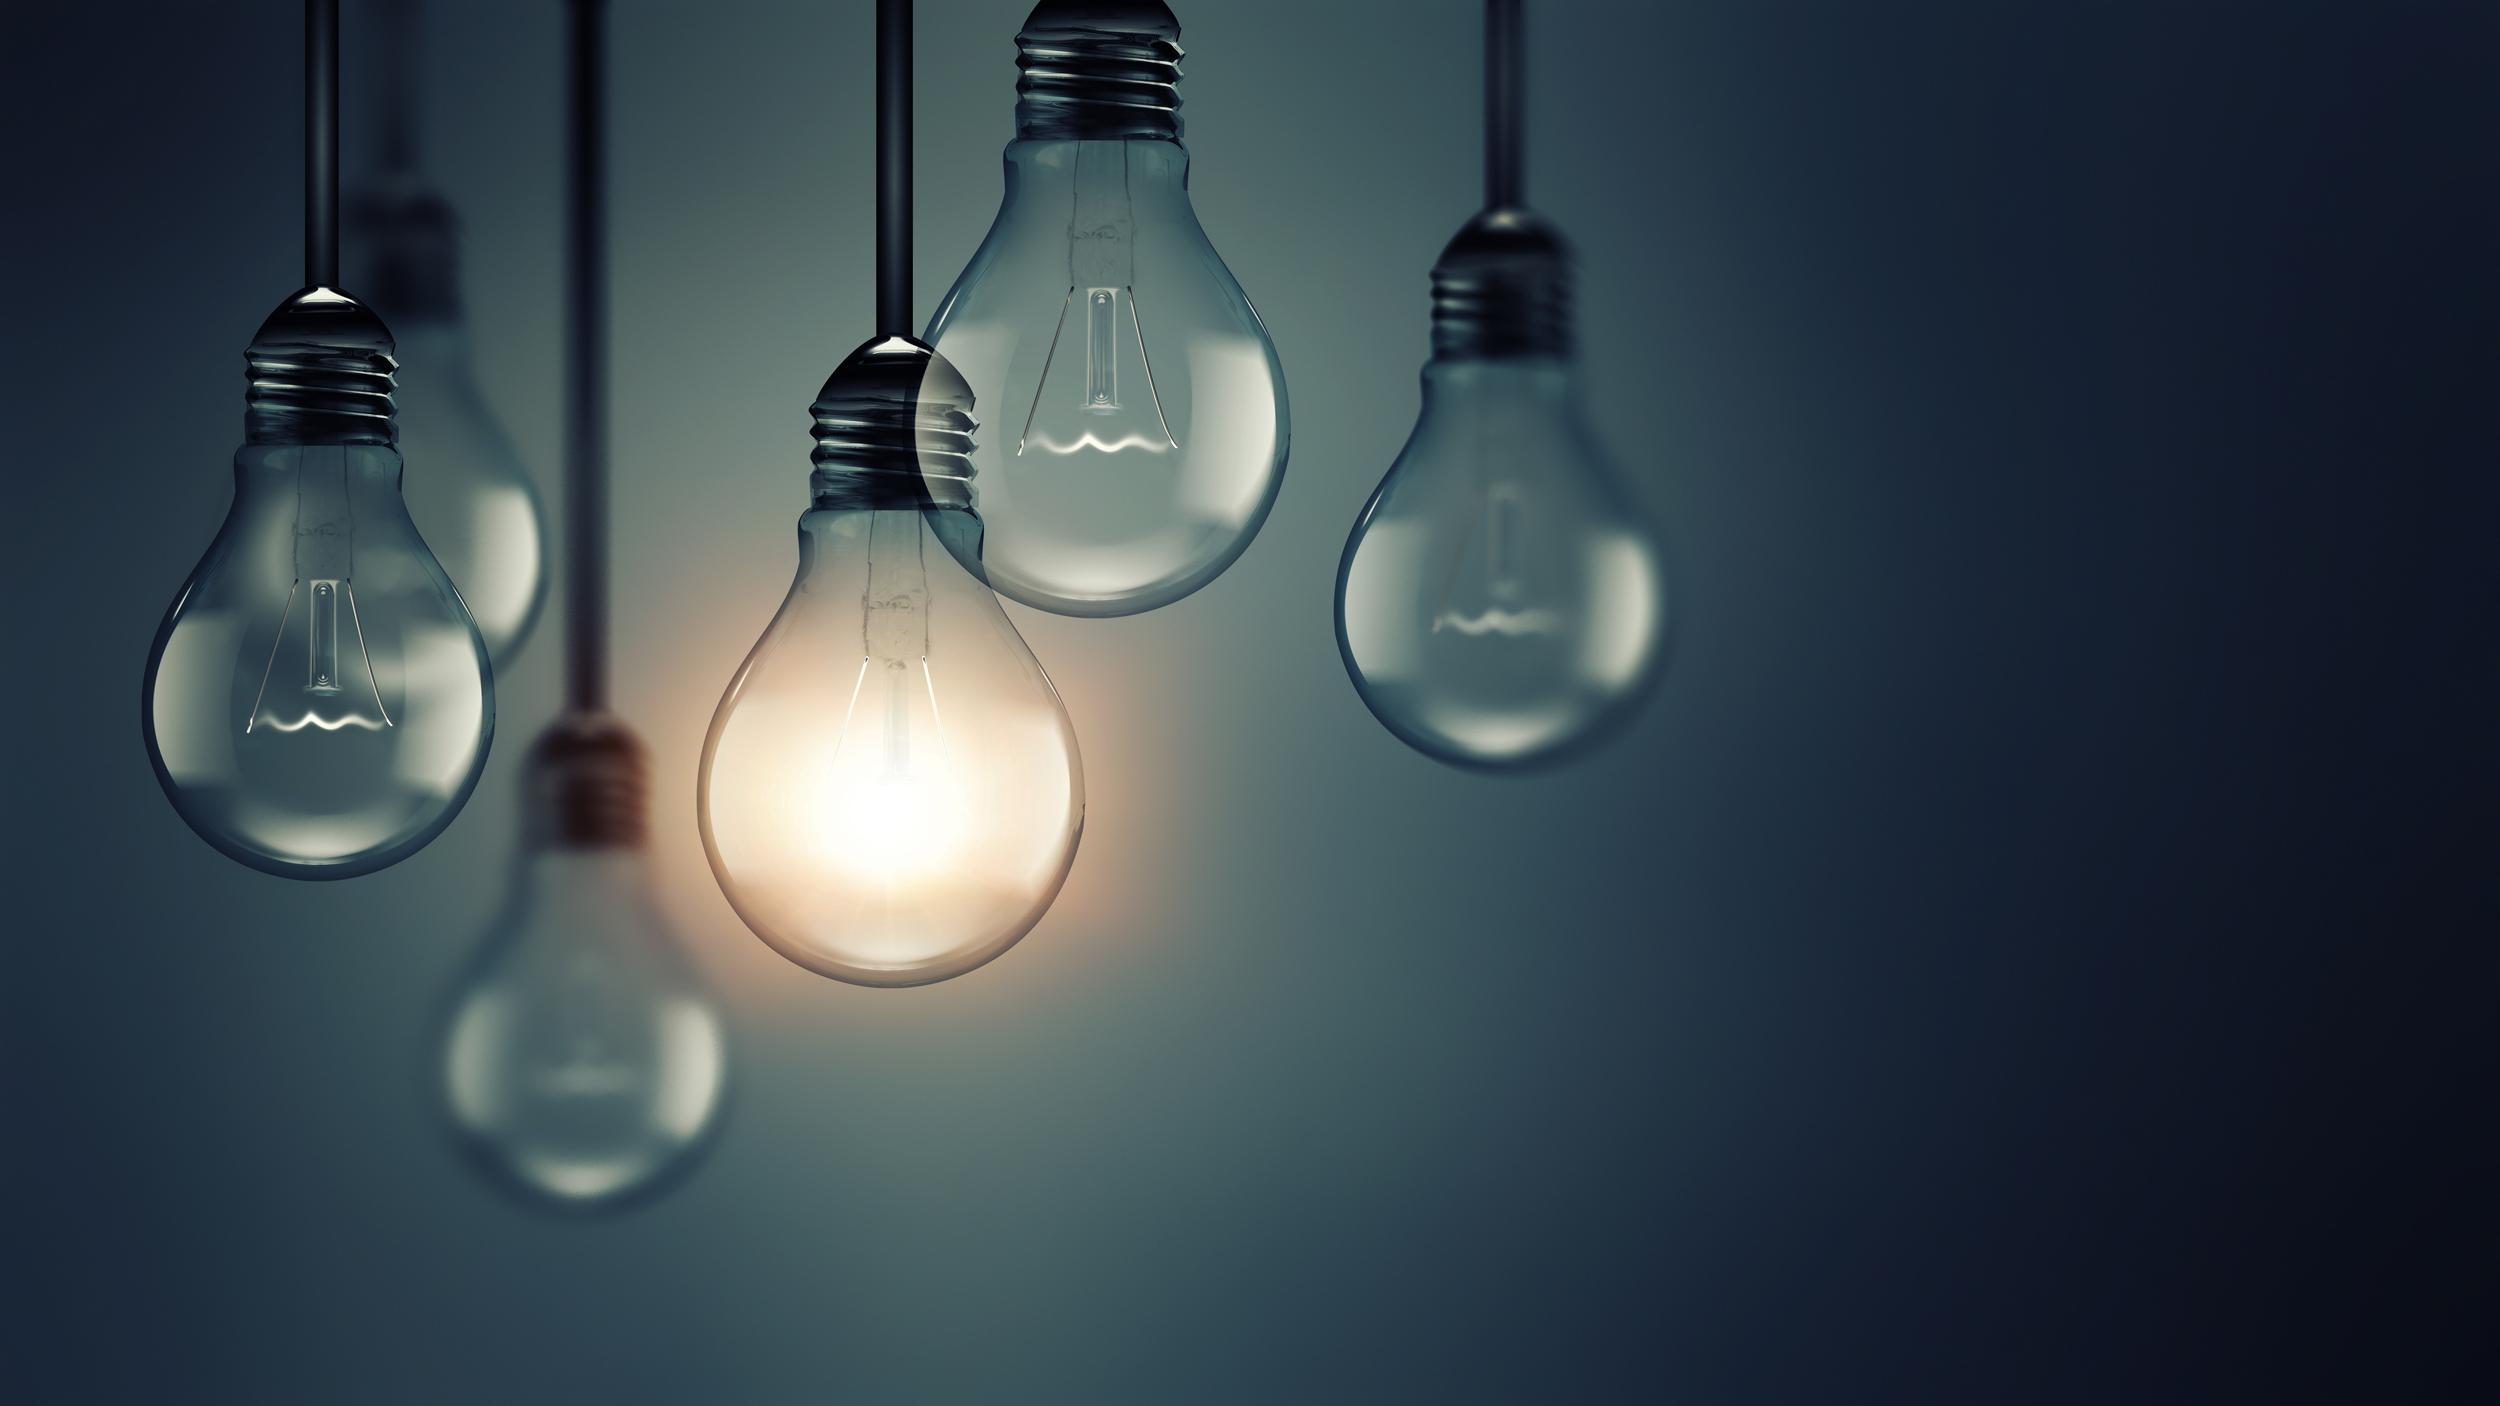 idea, concept, edison bulbs